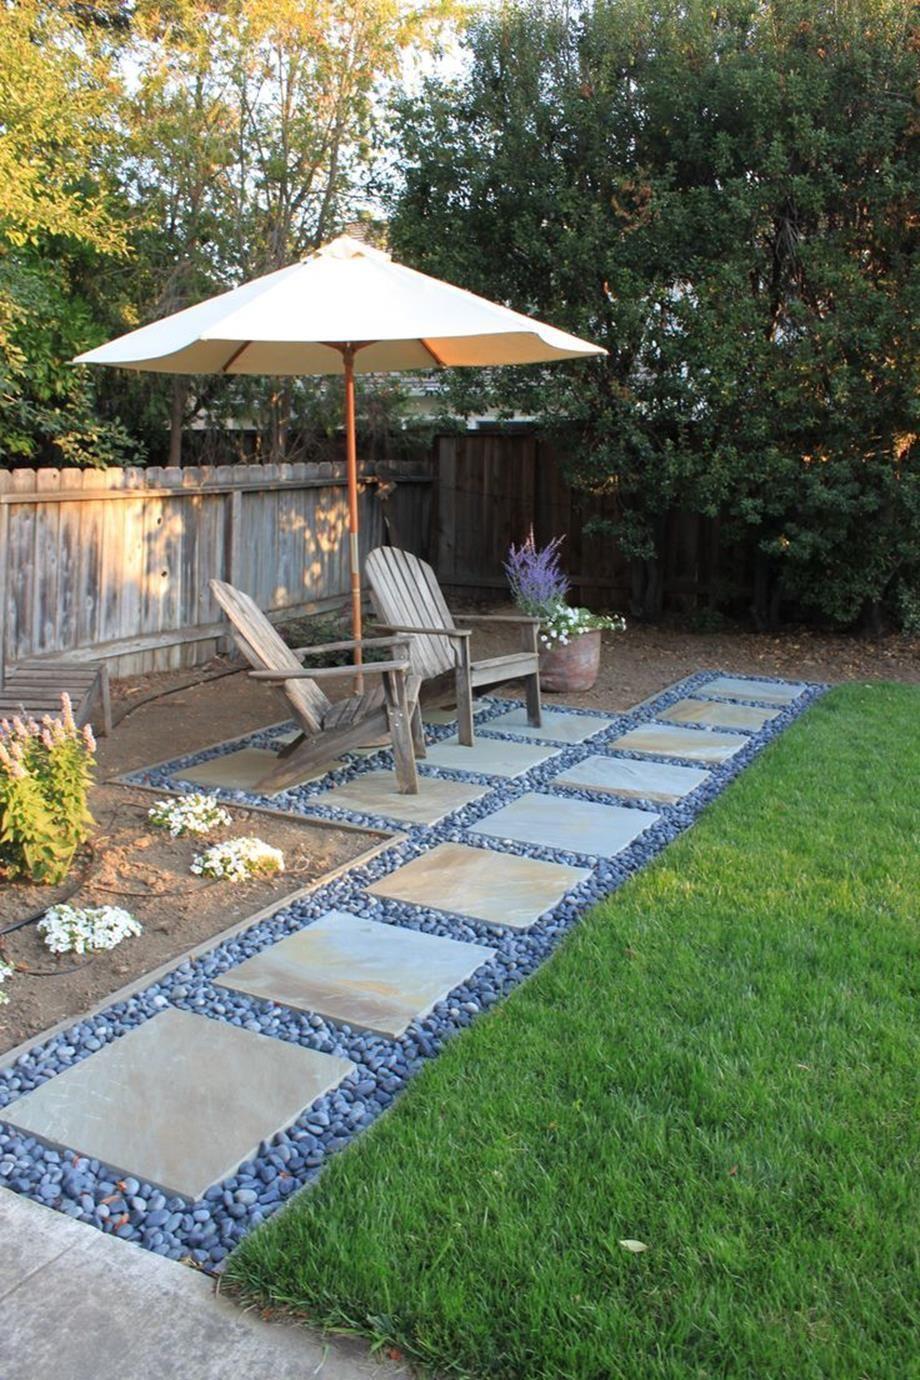 Photo of 30 Amazing Backyard Seating Ideas – Page 6 of 30 – Gardenholic